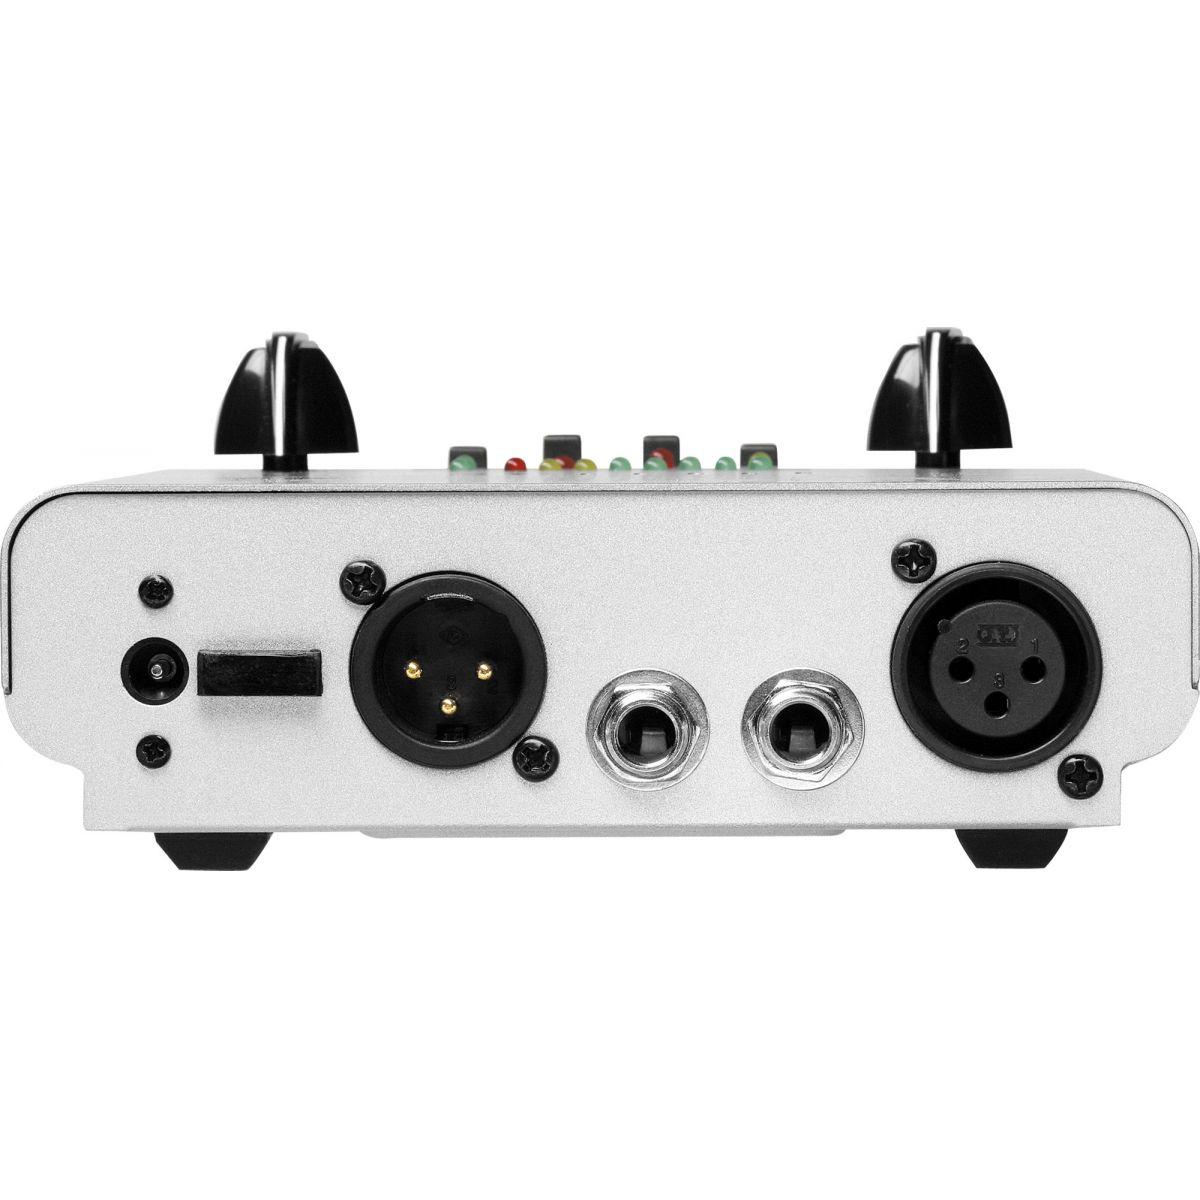 Behringer MIC100 Pré Amplificador De Tubo Com Limitador, 110v